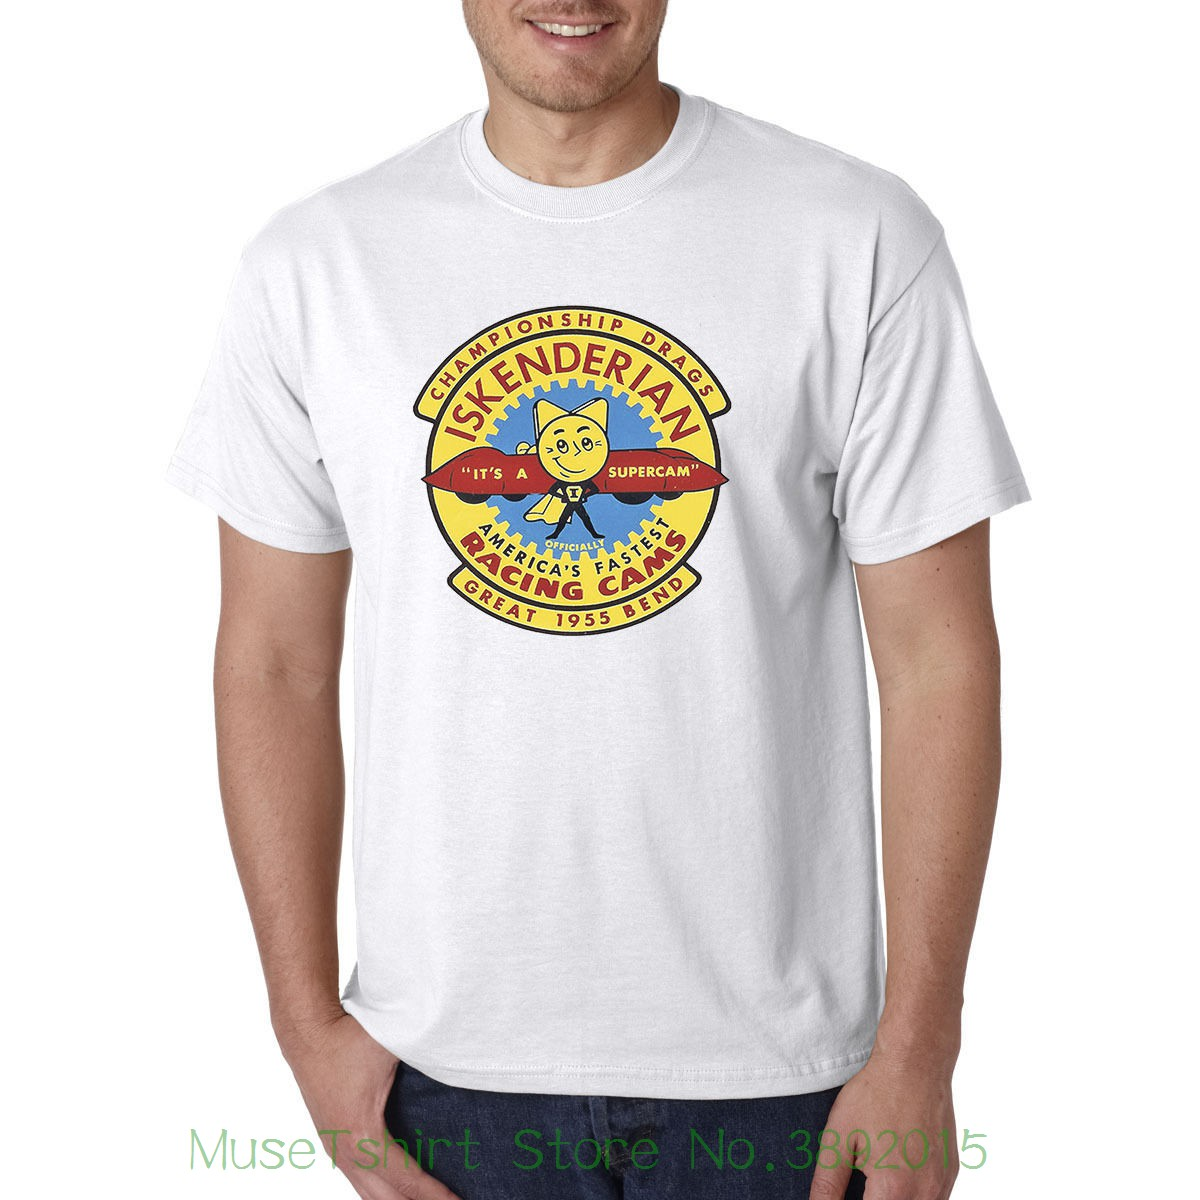 Iskenderian Racer Cams Vintage Decal / Retro Style T-shirt - Hot Rod Biker Tee Round Neck Men Top Tee